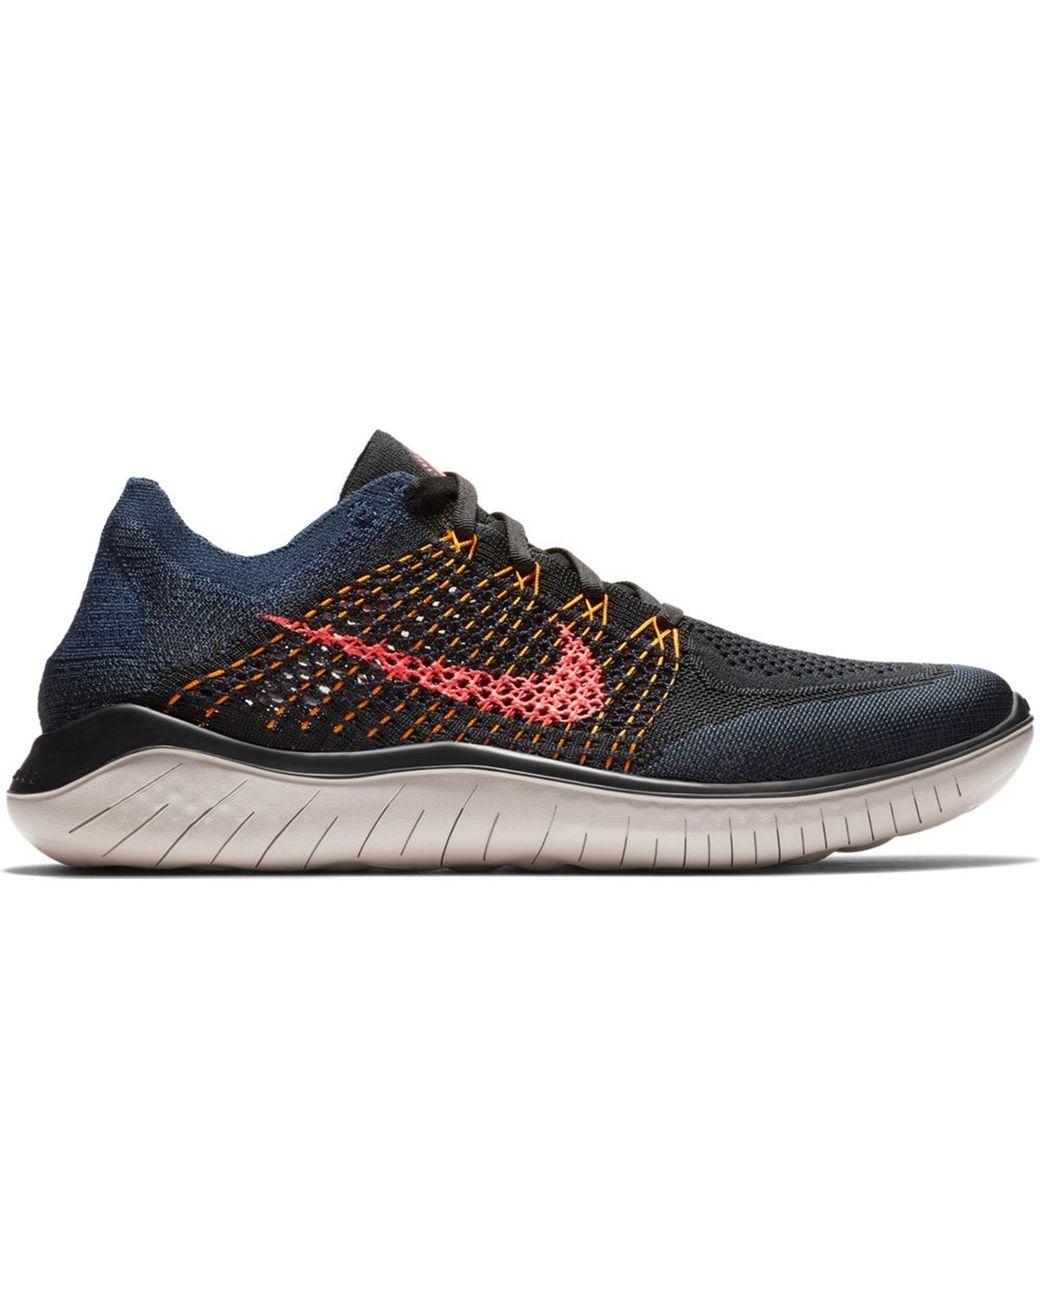 Nike Free Rn Flyknit 2018 Black Flash